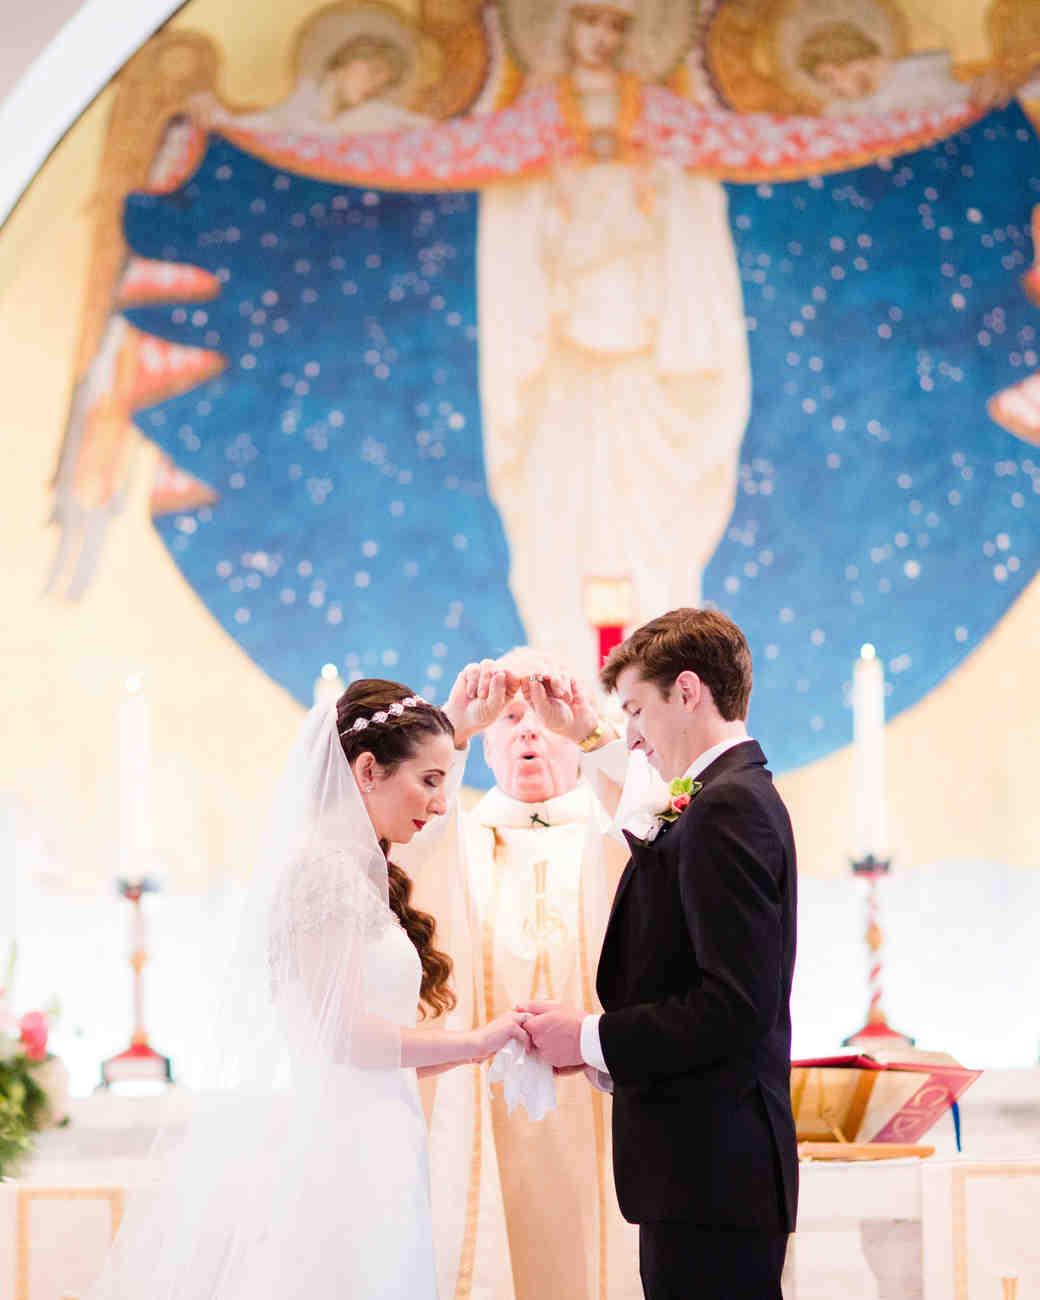 richelle-tom-wedding-ceremony-243-s112855-0416.jpg